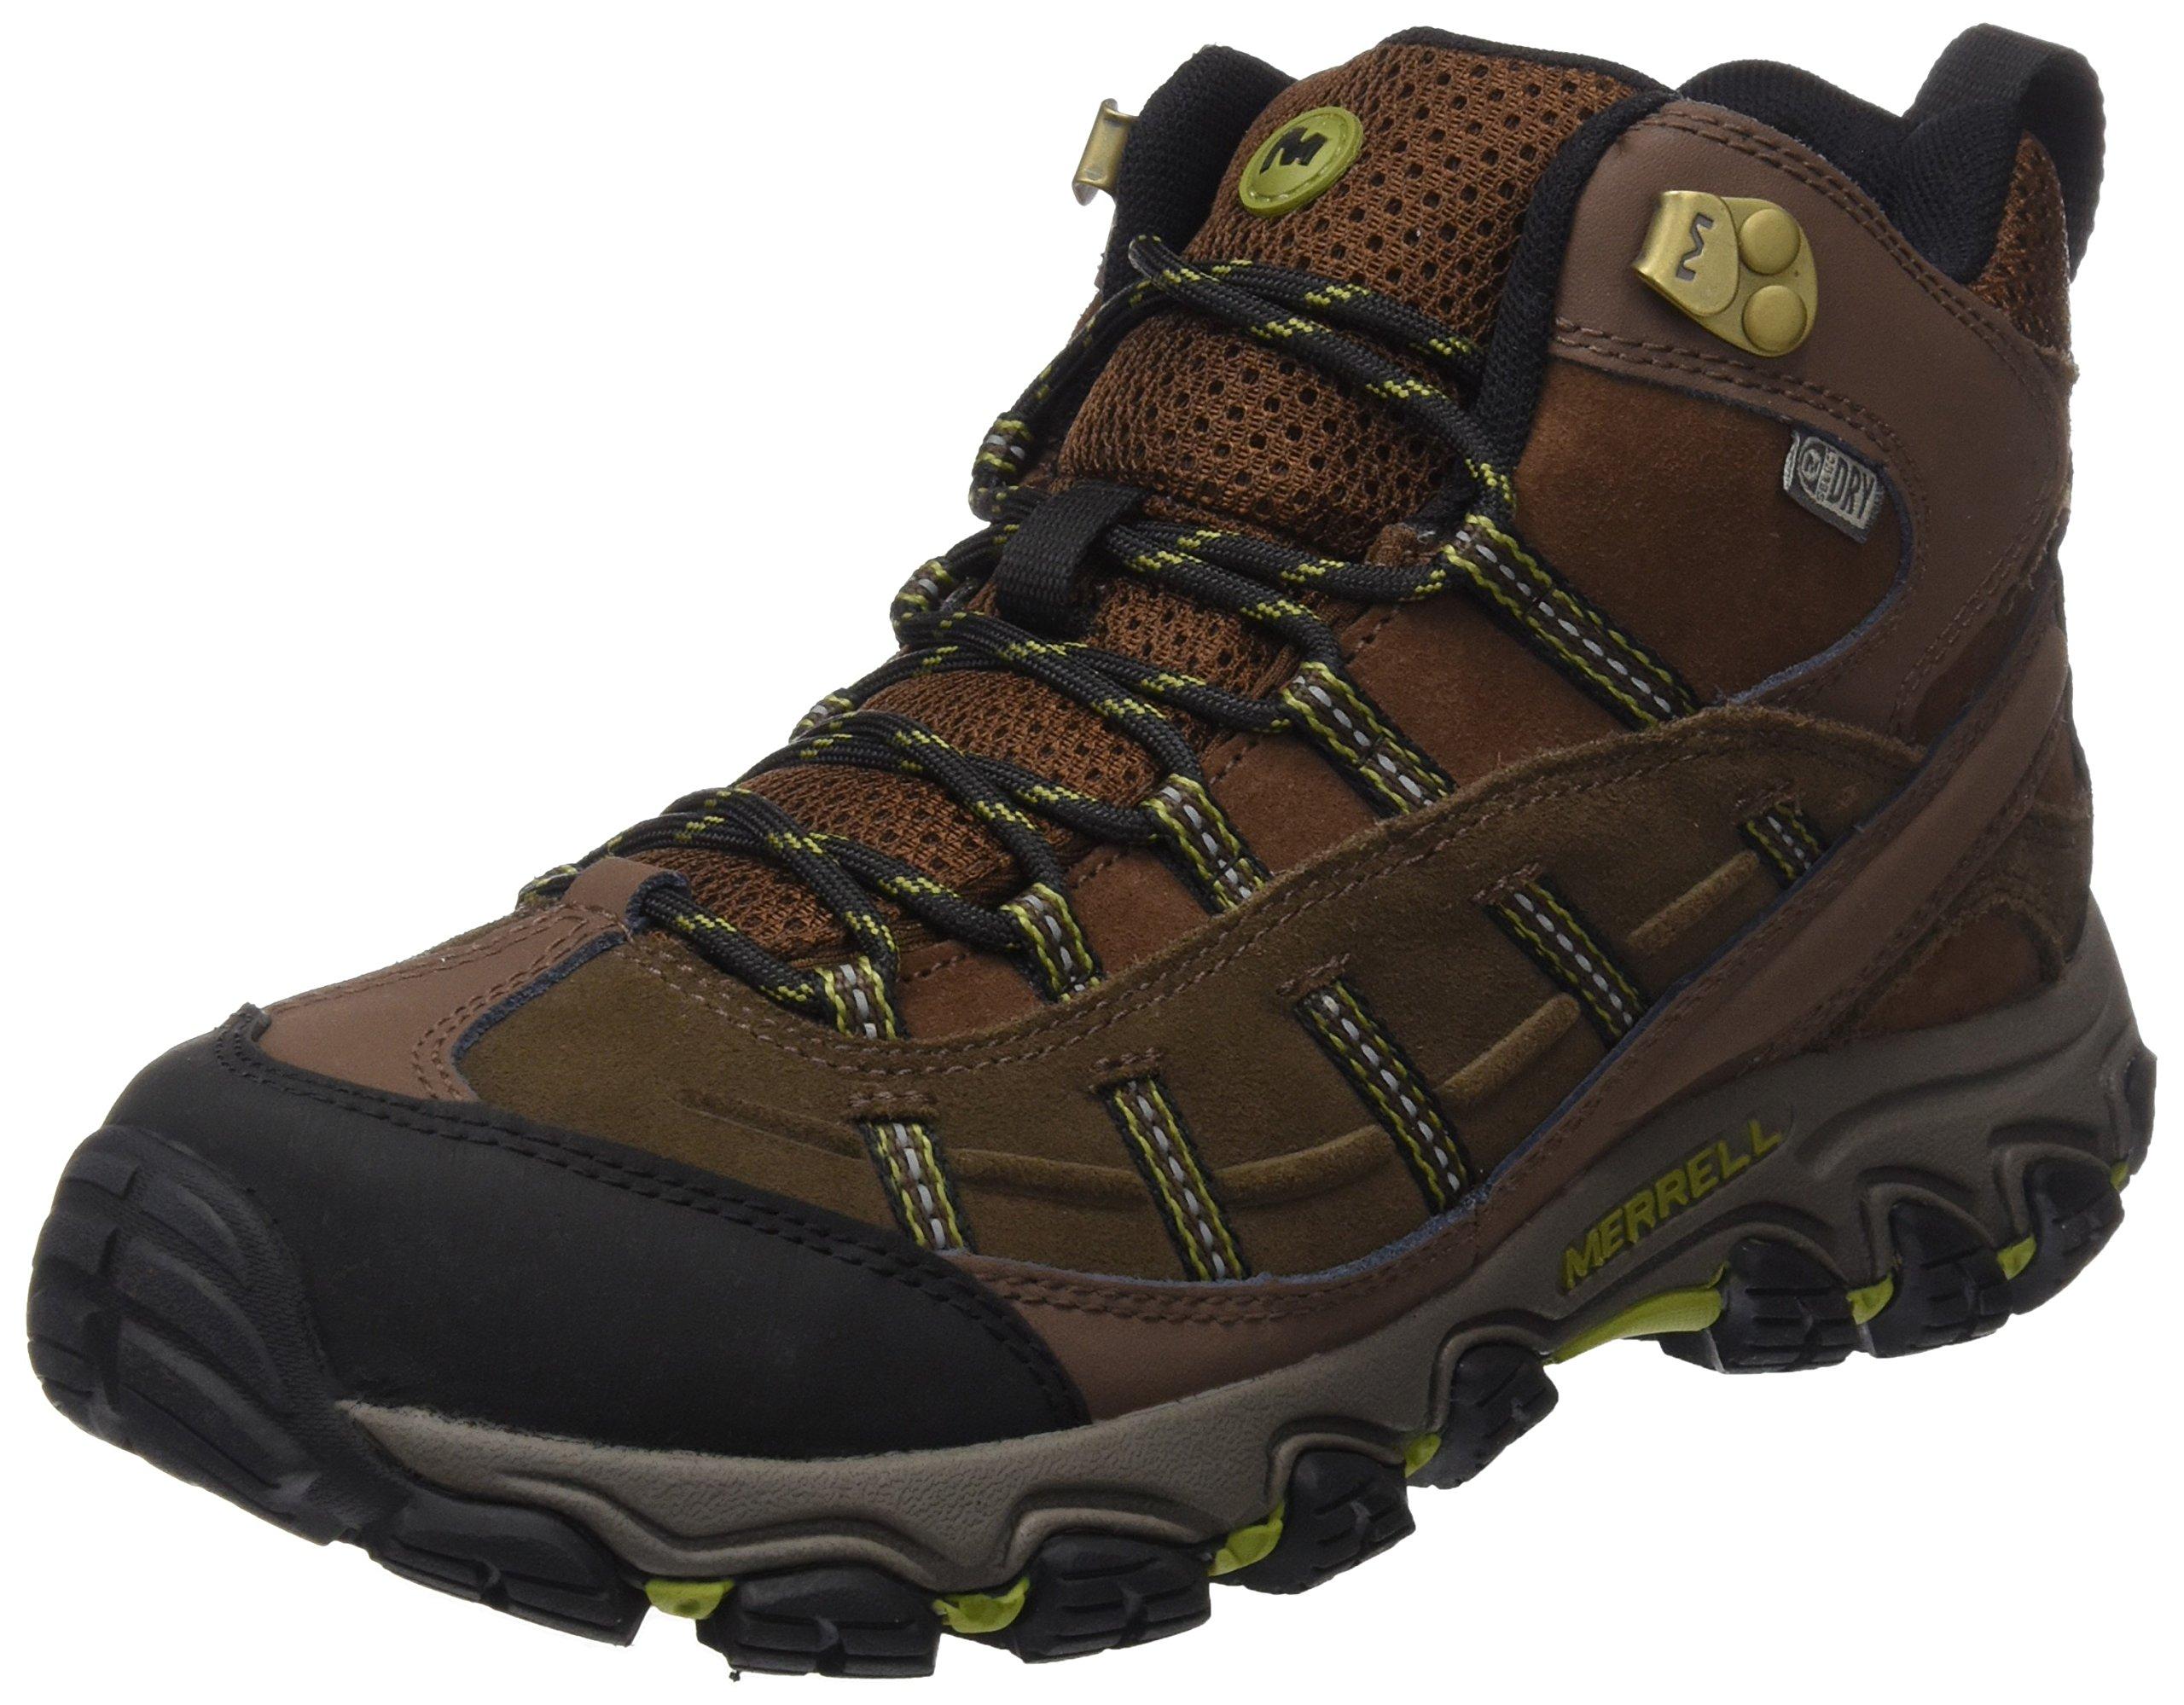 91roNJphqPL - Merrell Men's Terramorph Mid Waterproof High Rise Hiking Boots